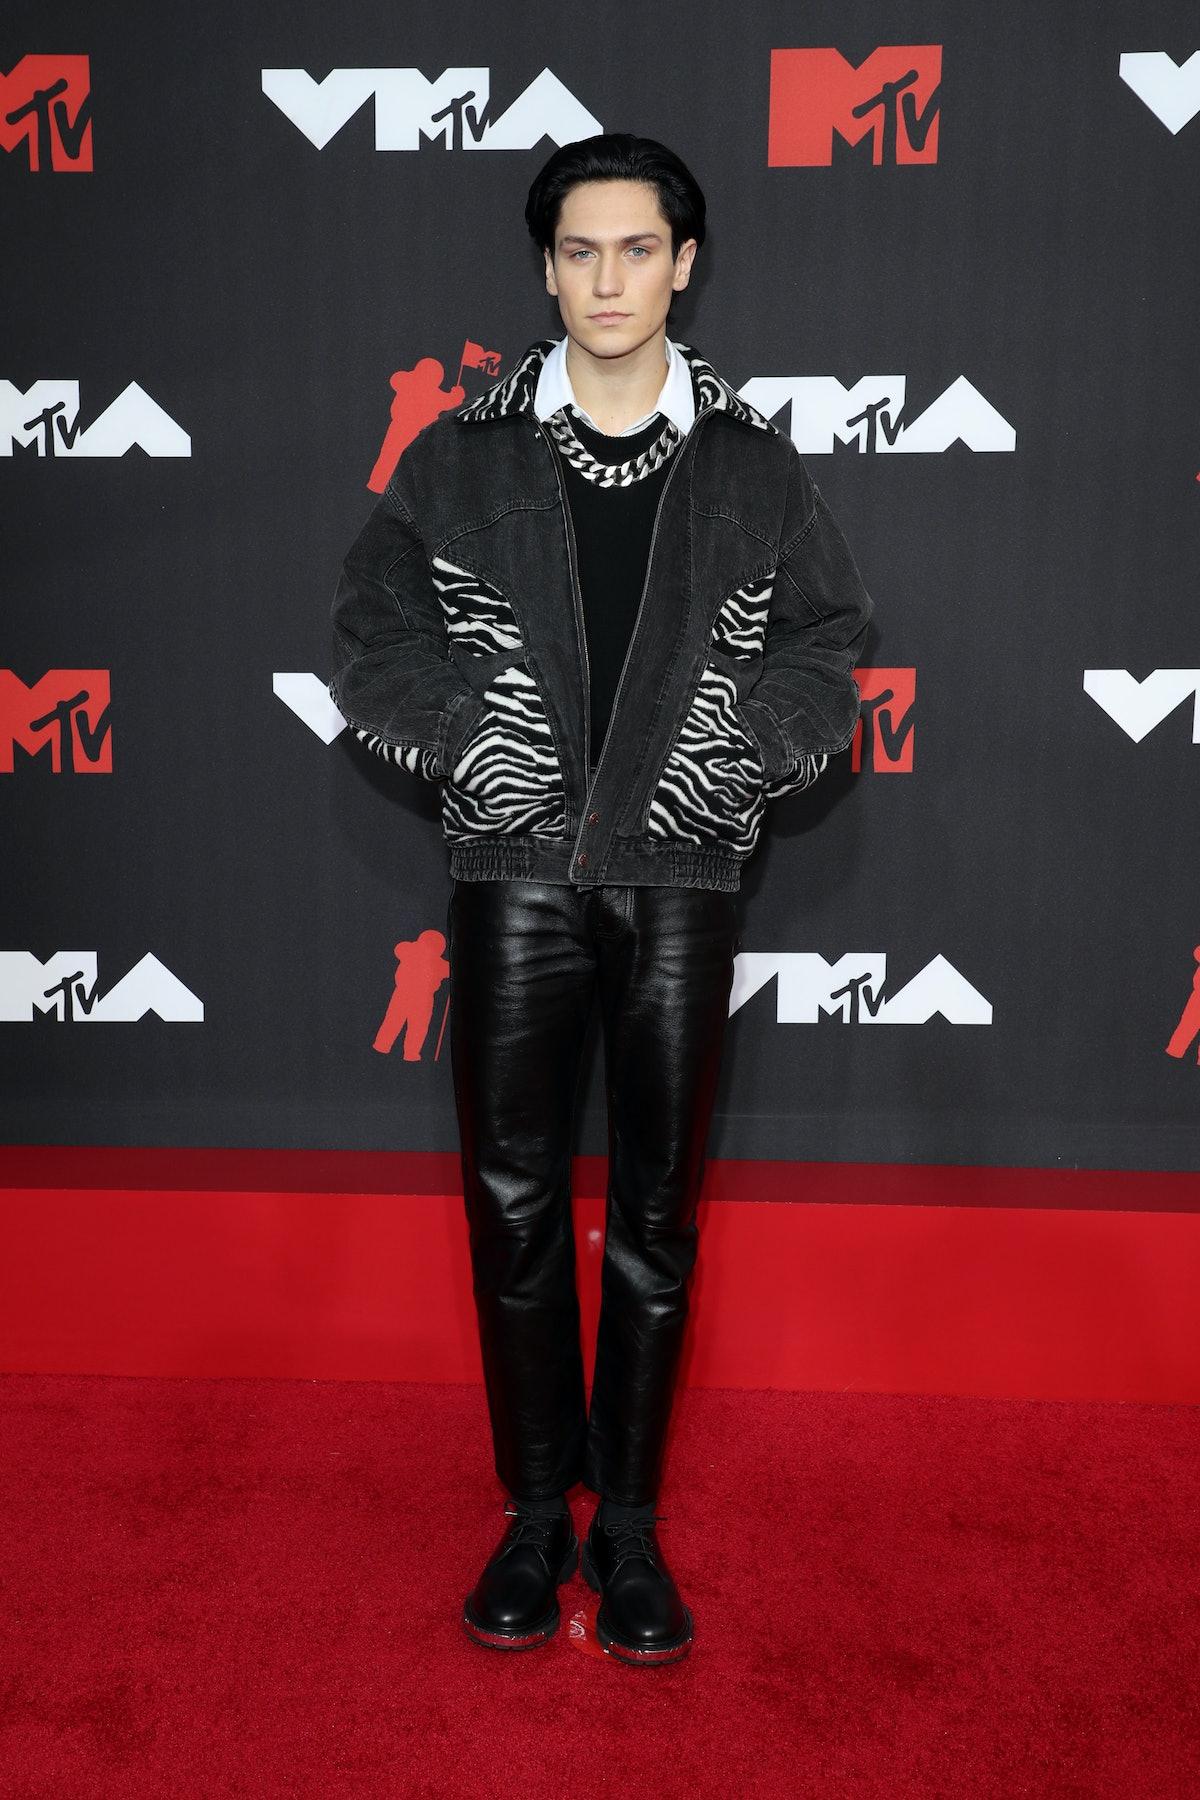 NEW YORK, NEW YORK - SEPTEMBER 12: Lil Huddy attends the 2021 MTV Video Music Awards at Barclays Cen...